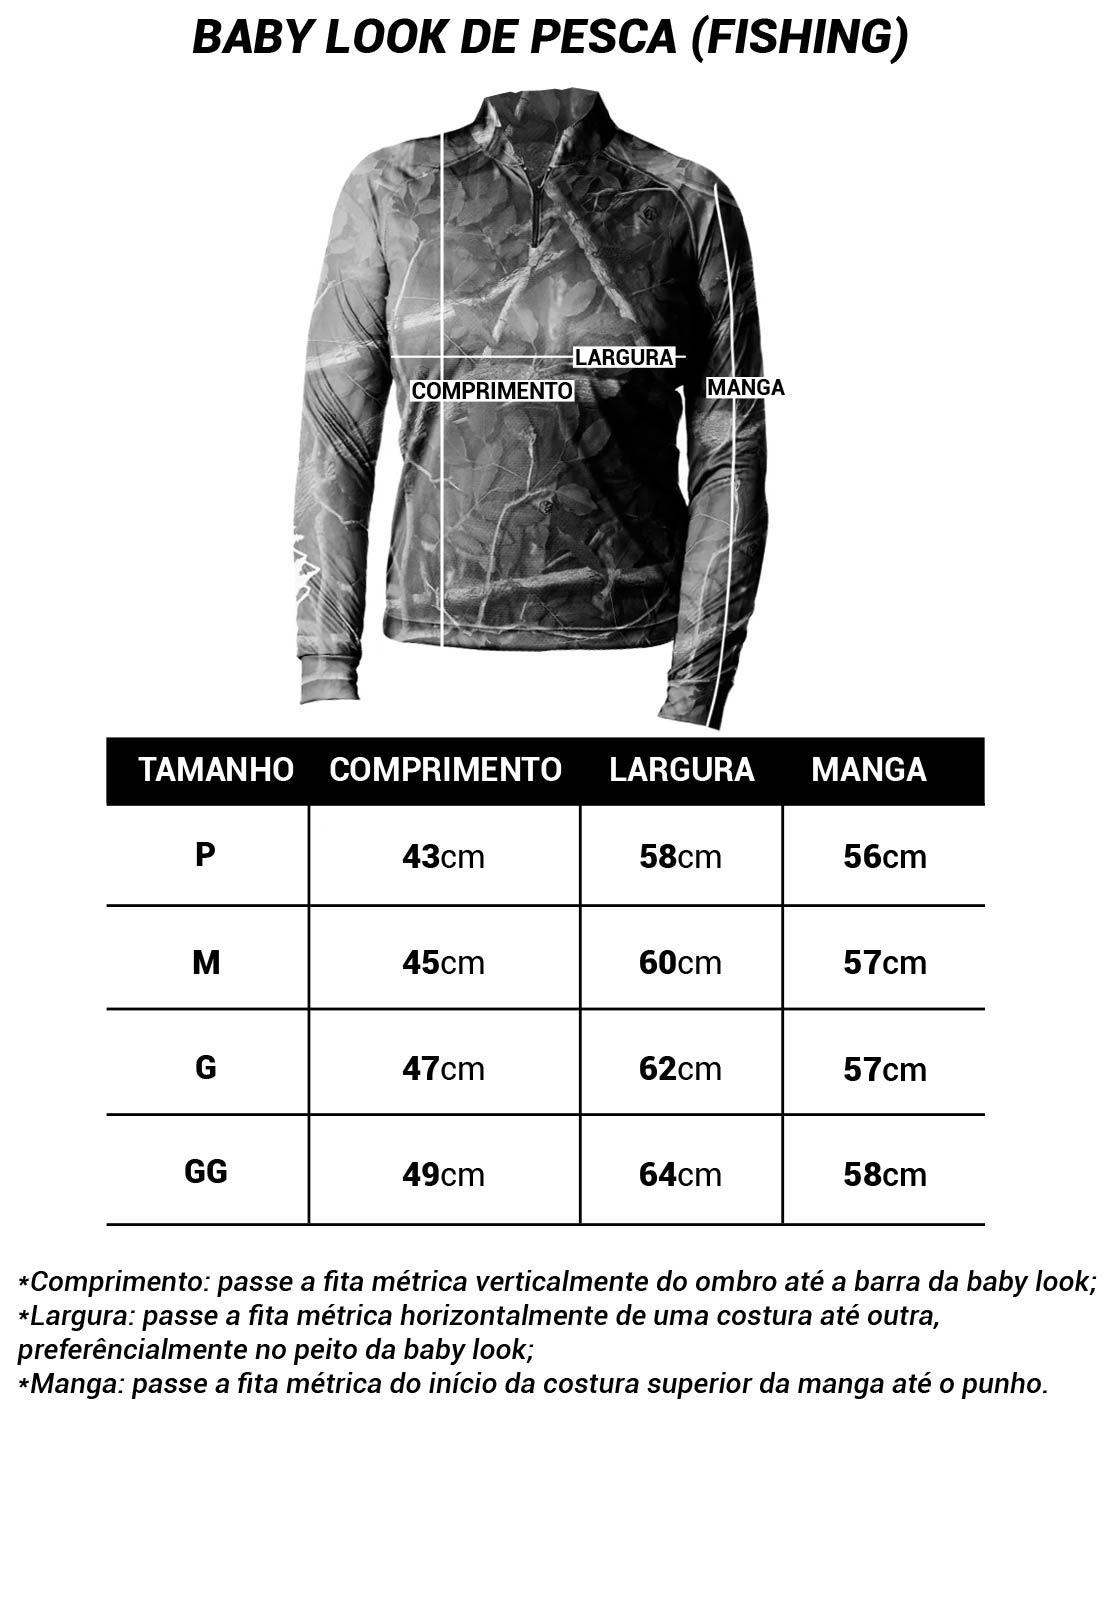 CAMISA DE PESCA FISH CAMUFLADA PRO 14 FEMININA + BANDANA GRÁTIS  - REAL HUNTER OUTDOORS